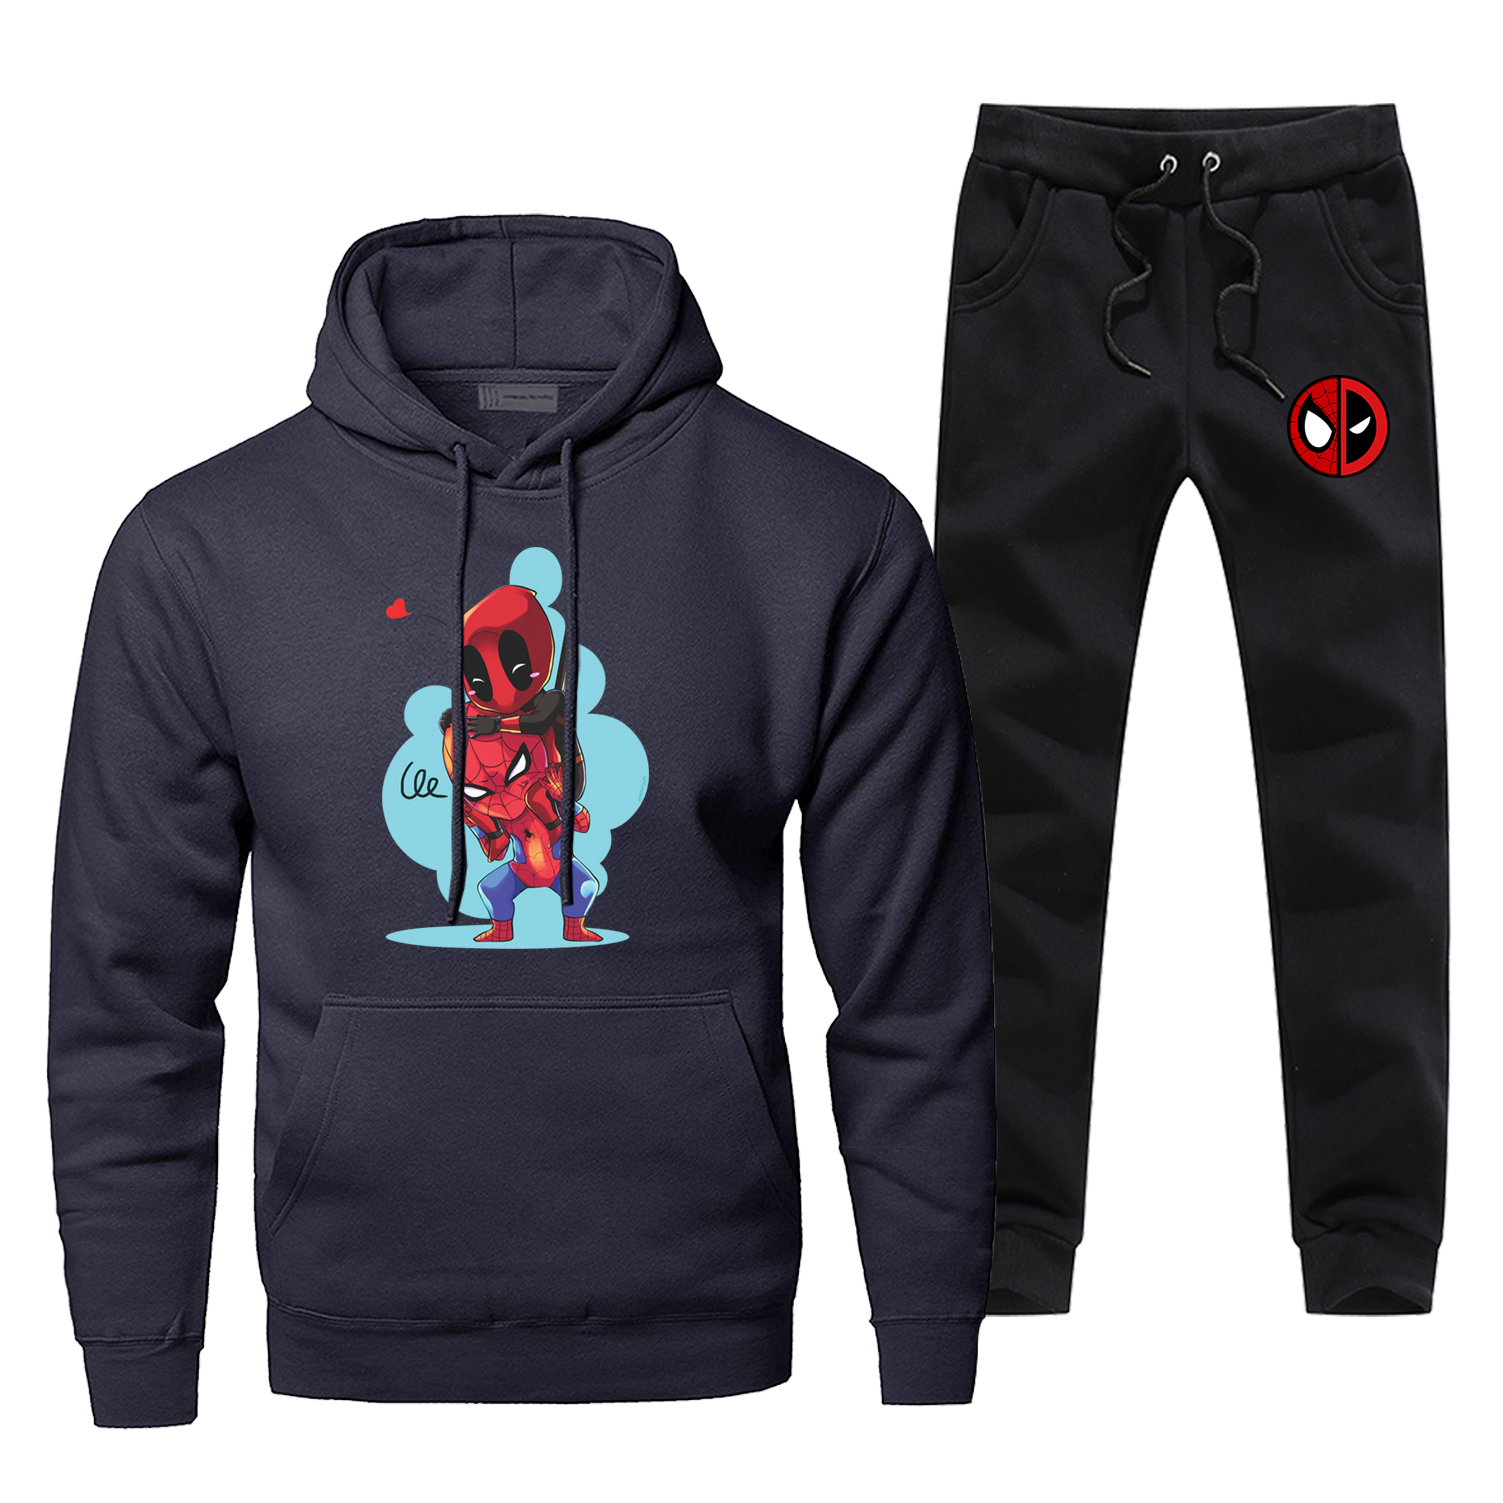 Super Hero Funny Casaul Male Set Deadpool Fleece Fashion Men's Full Suit Tracksuit Spider-Man Comfortable Hip Hop Sportsman Wear